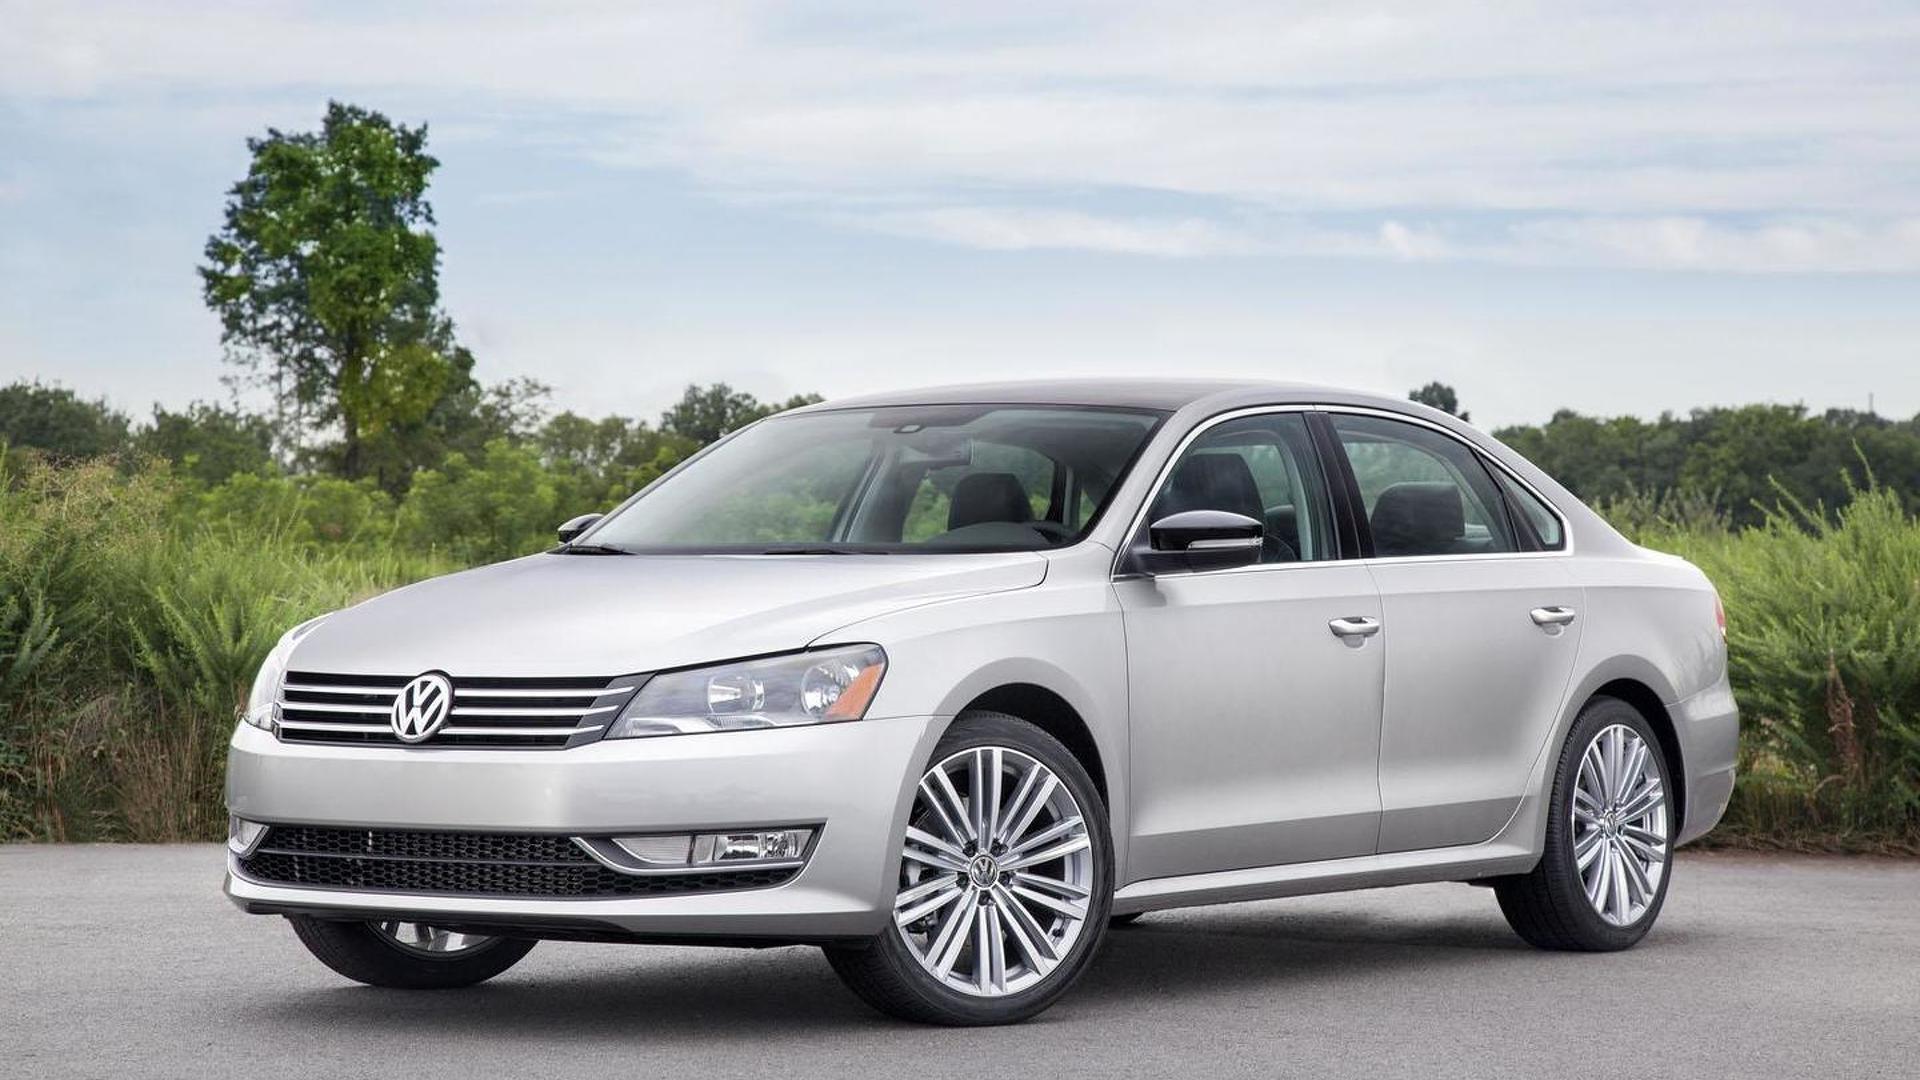 Volkswagen exec hints at big changes for the 2016 Passat facelift - report